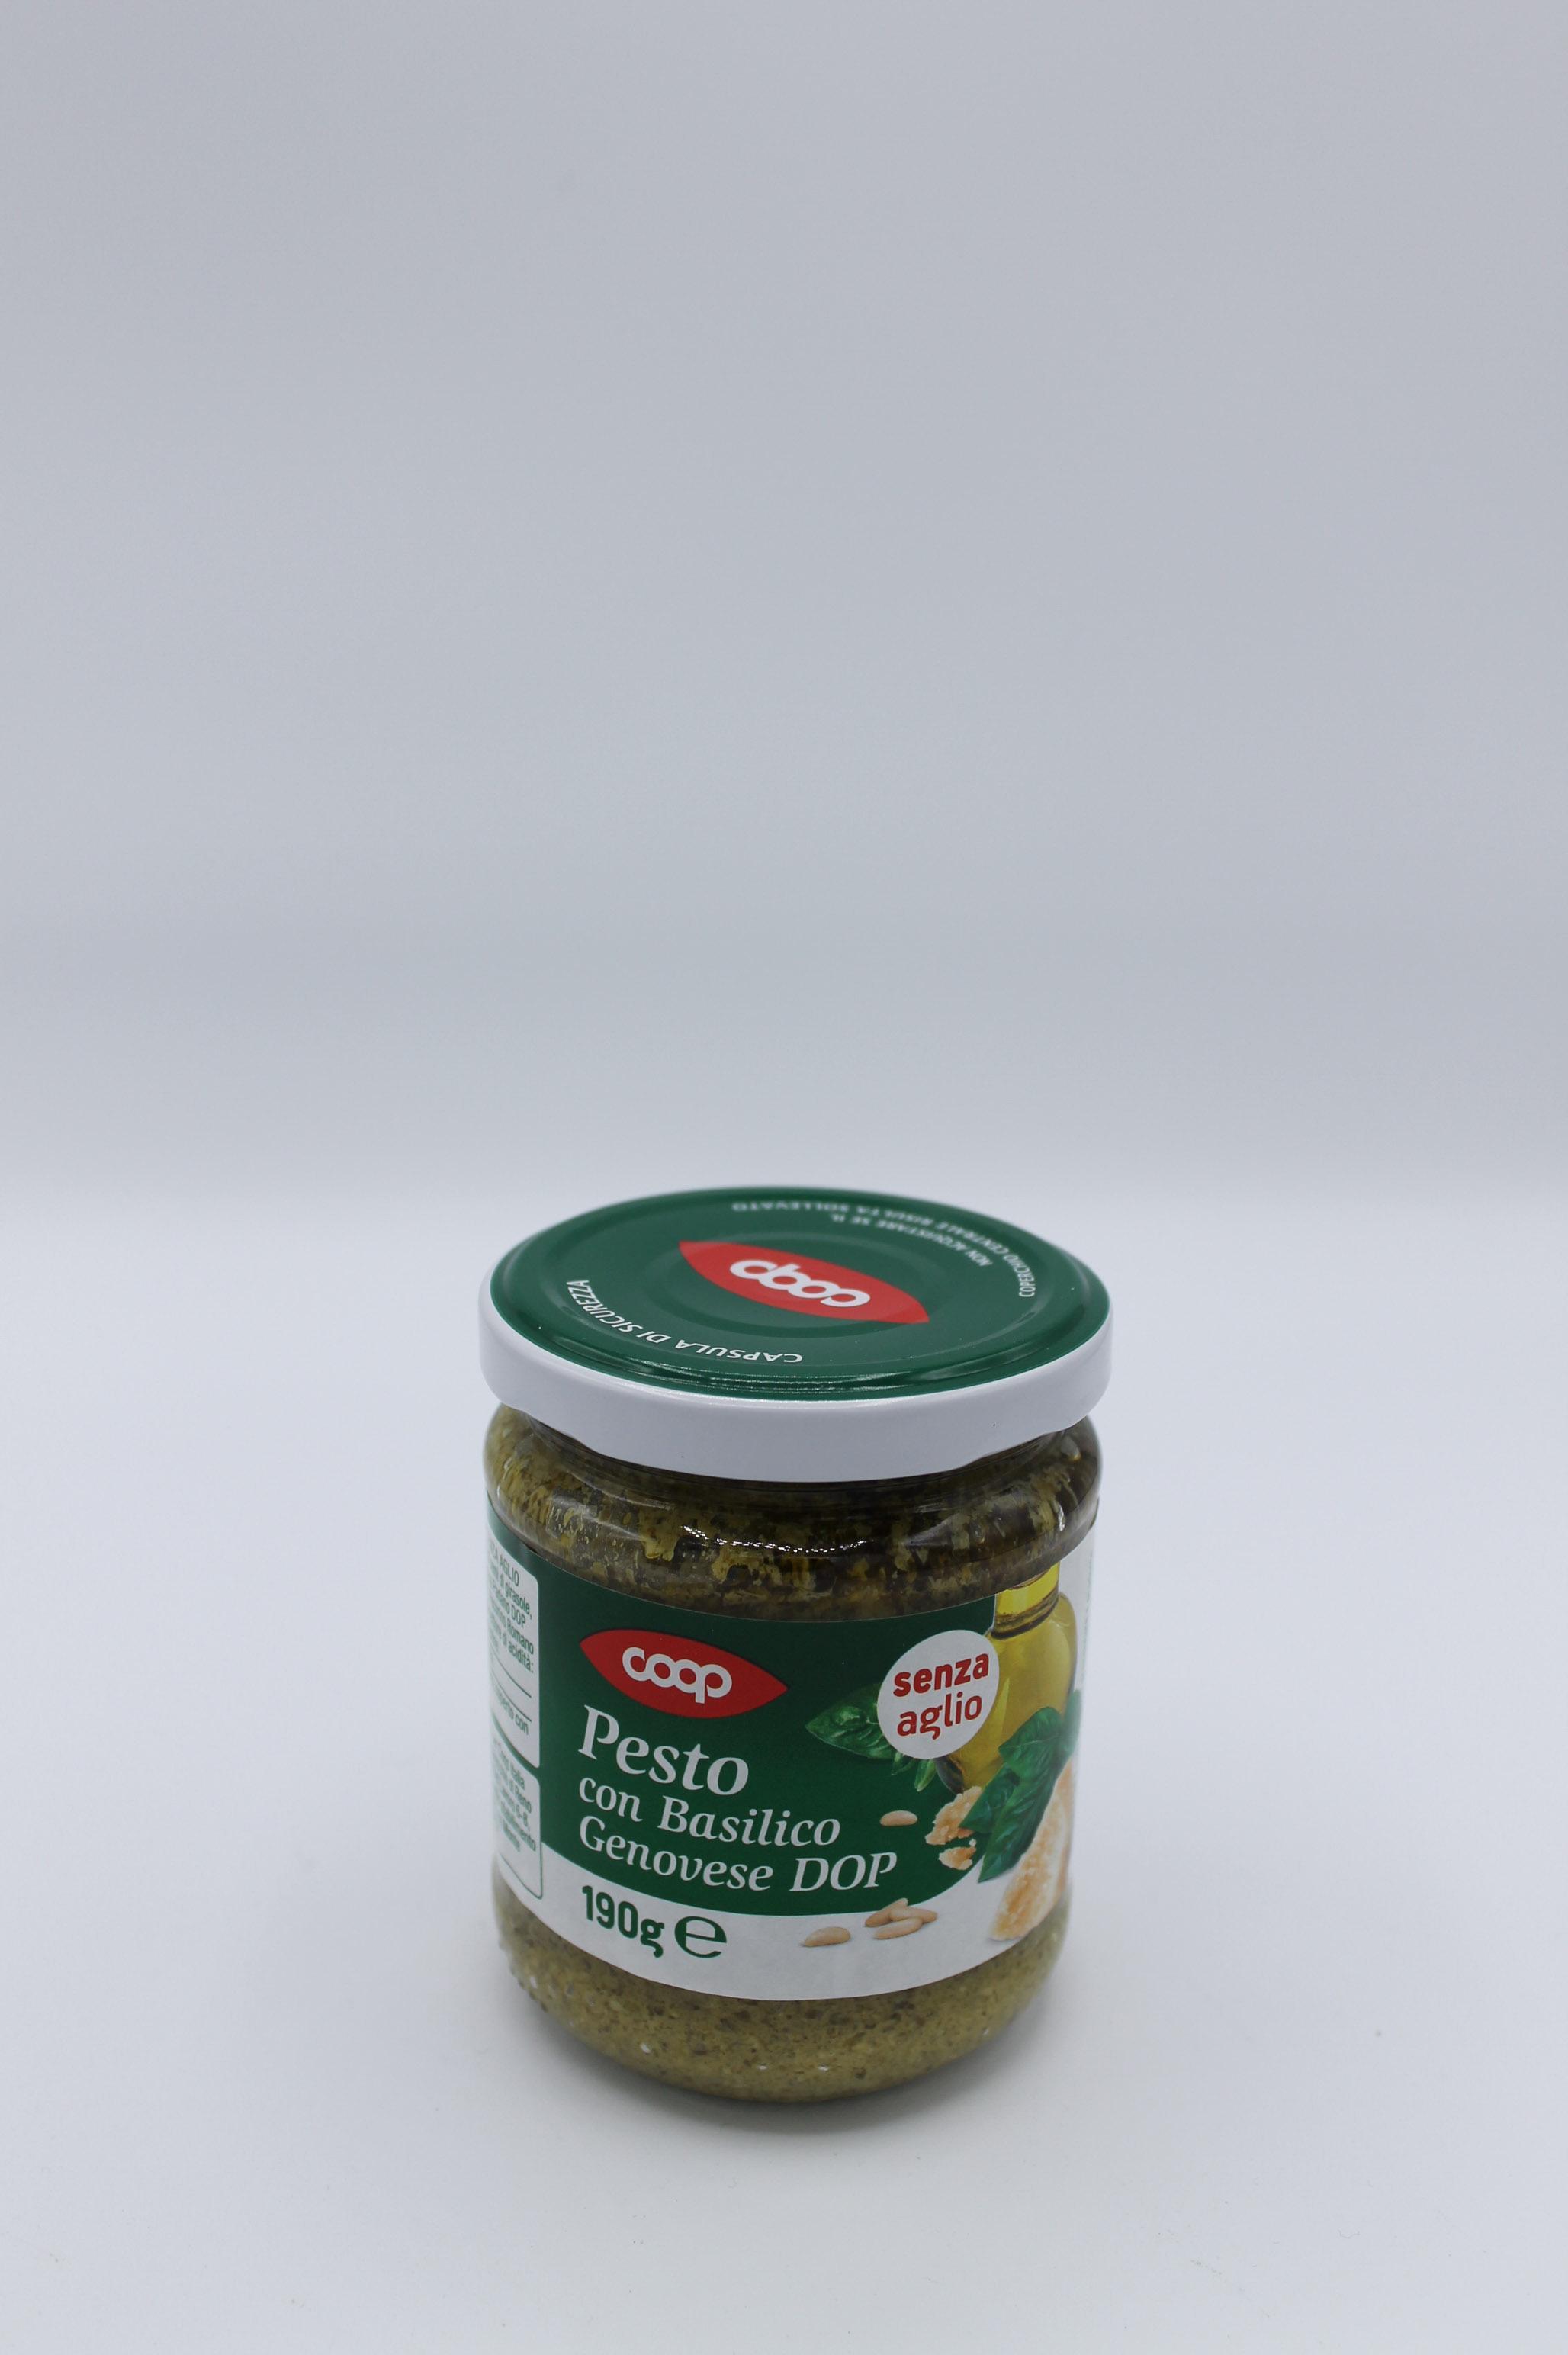 Coop pesto senza aglio 190 gr.